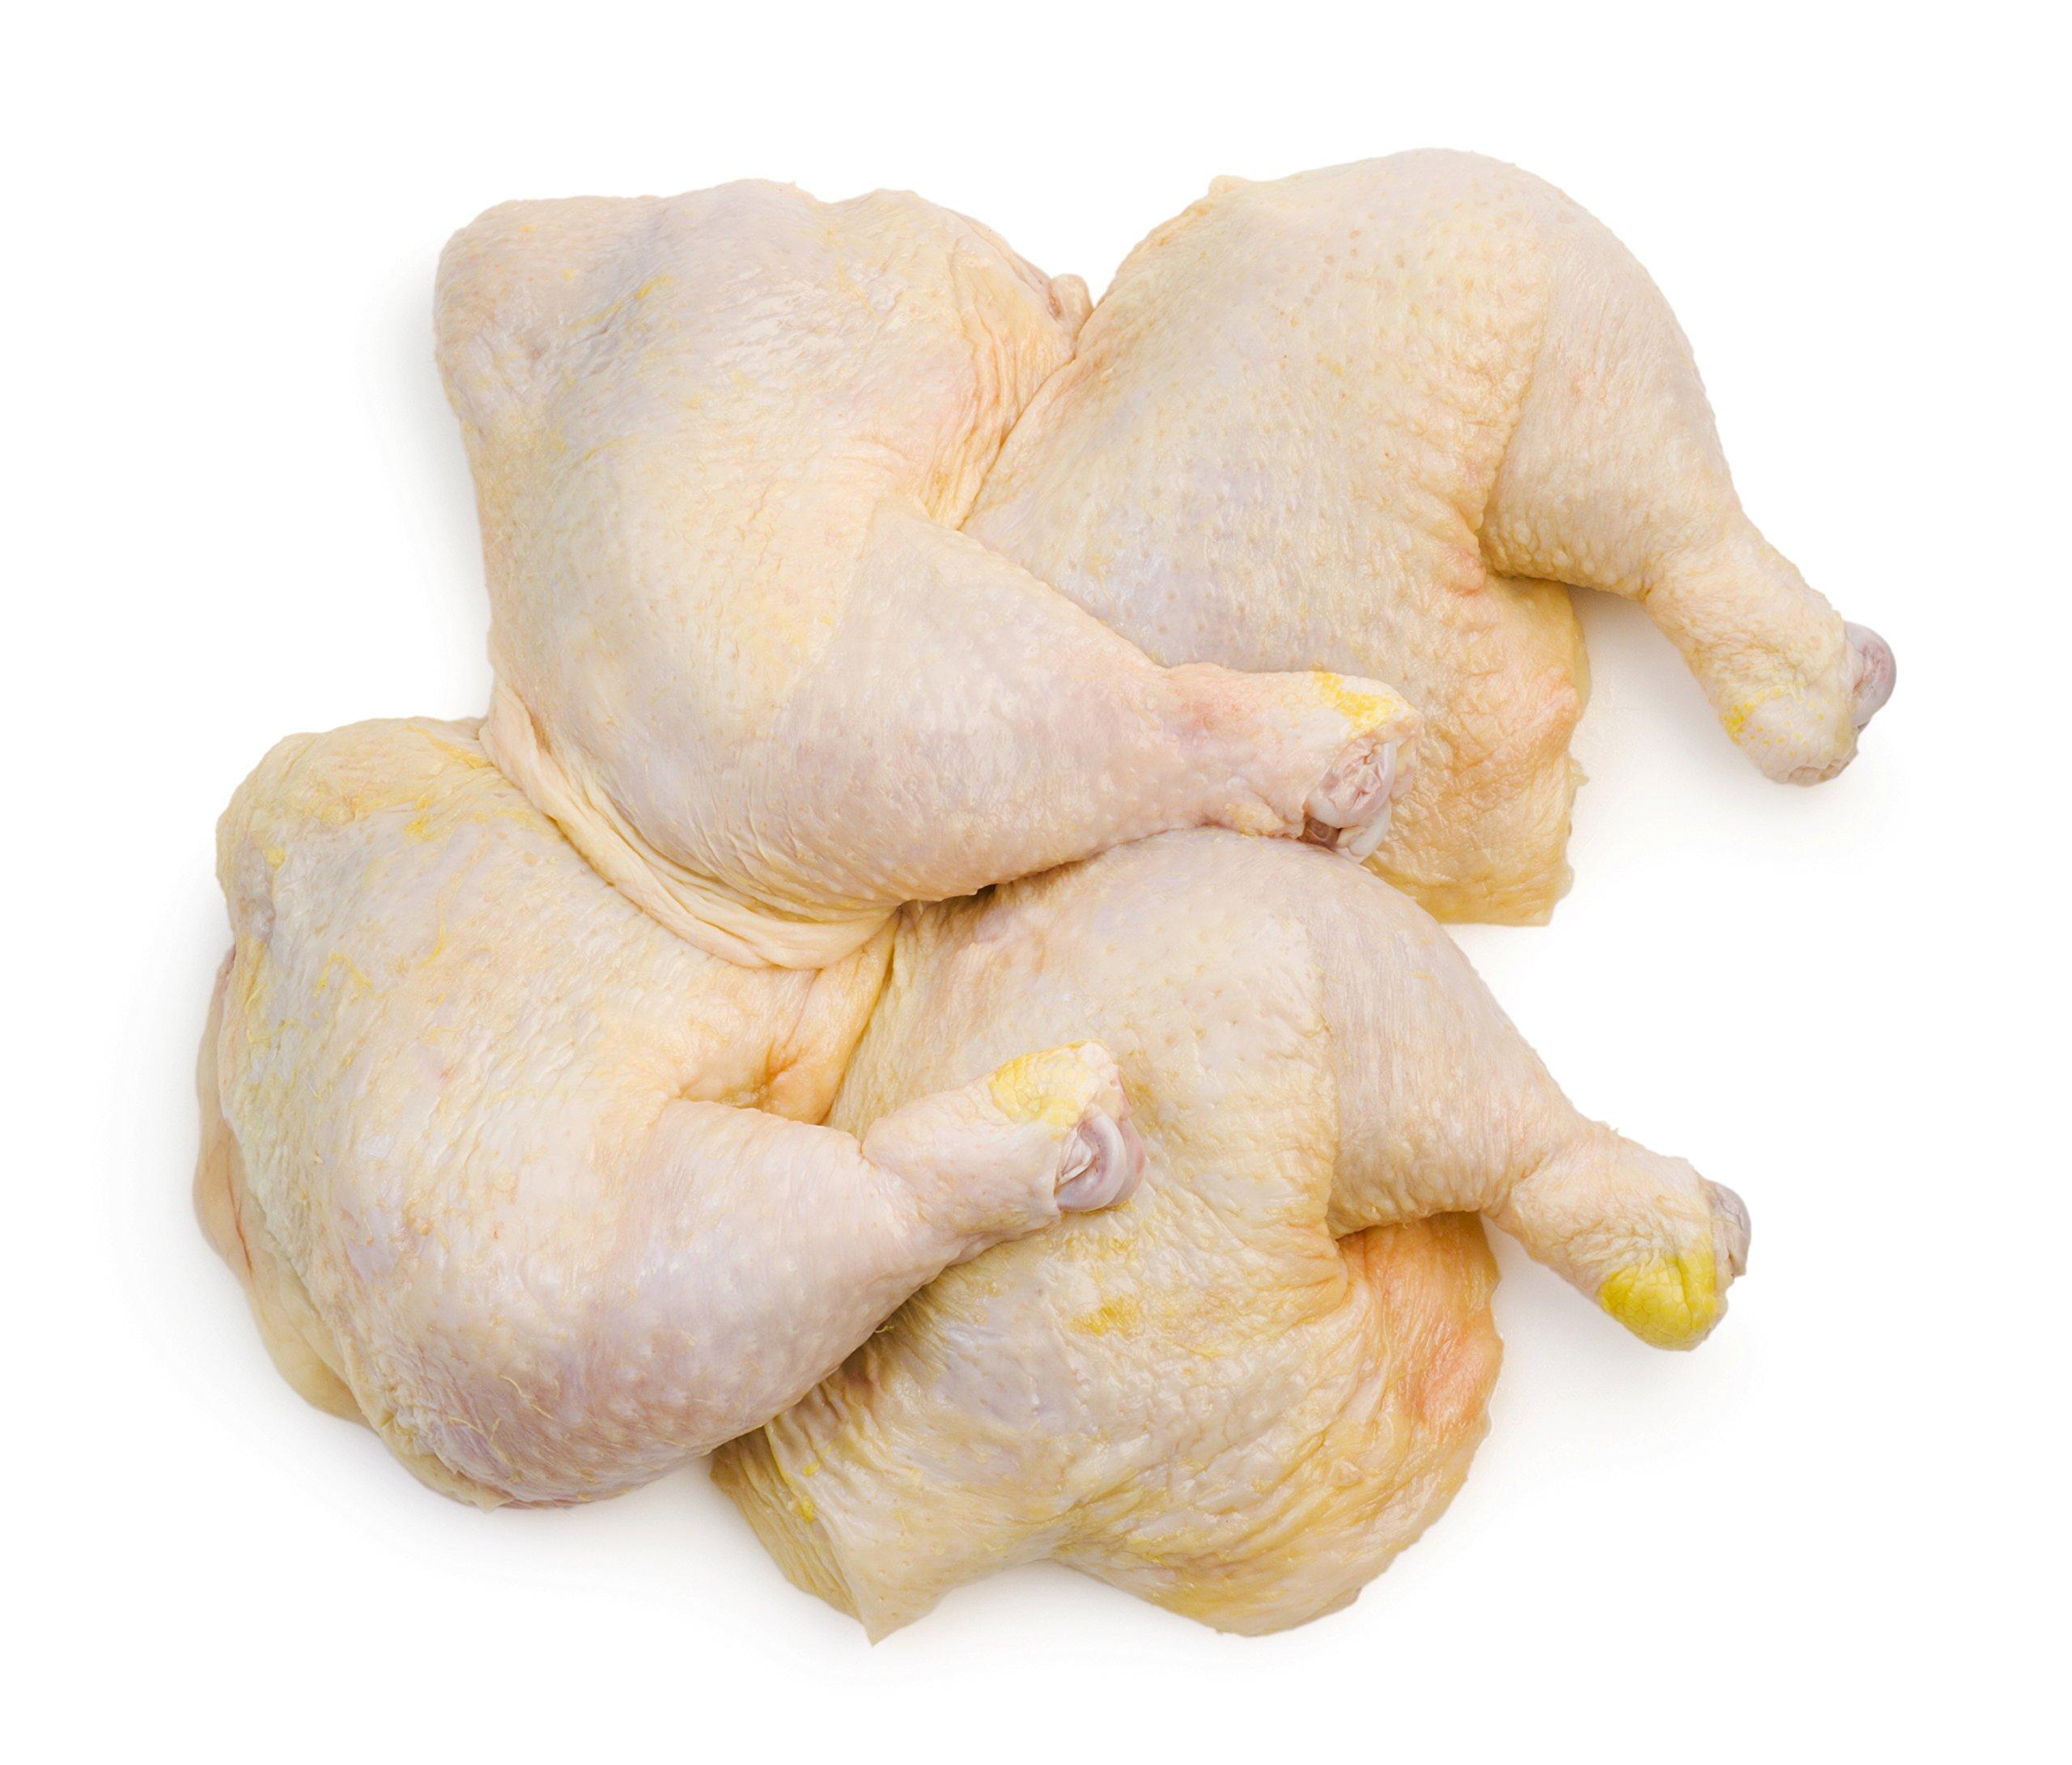 Double Certified Organic Whole Chicken Leg Quarters (9.25-9.75 Lbs) - Glatt Kosher